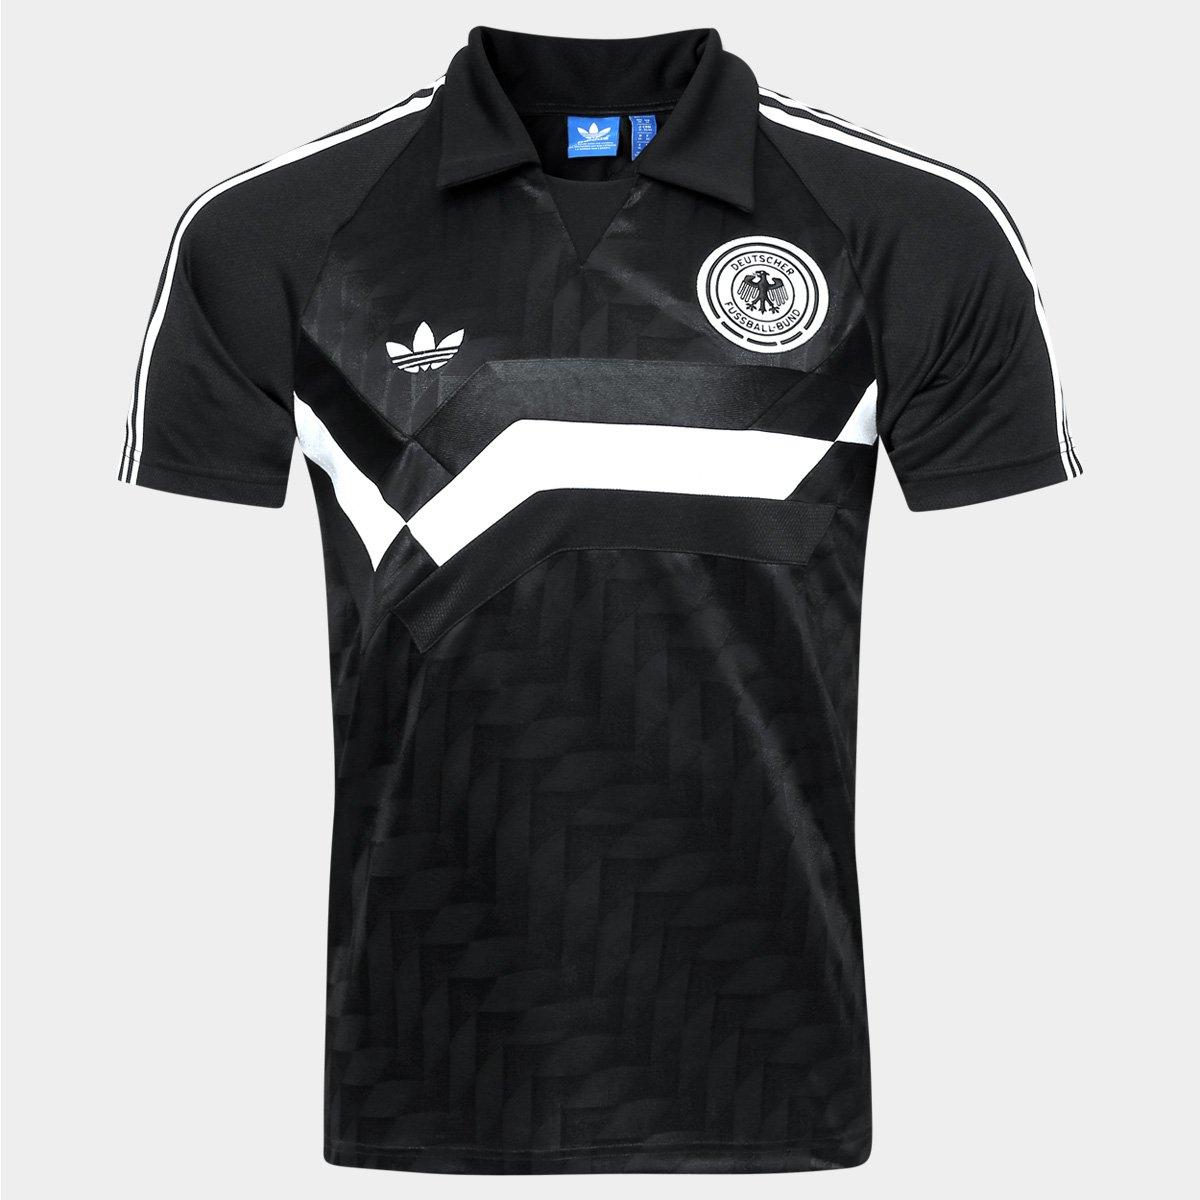 Camisa Alemanha Adidas Away Masculina - Compre Agora  b12d050bfa256